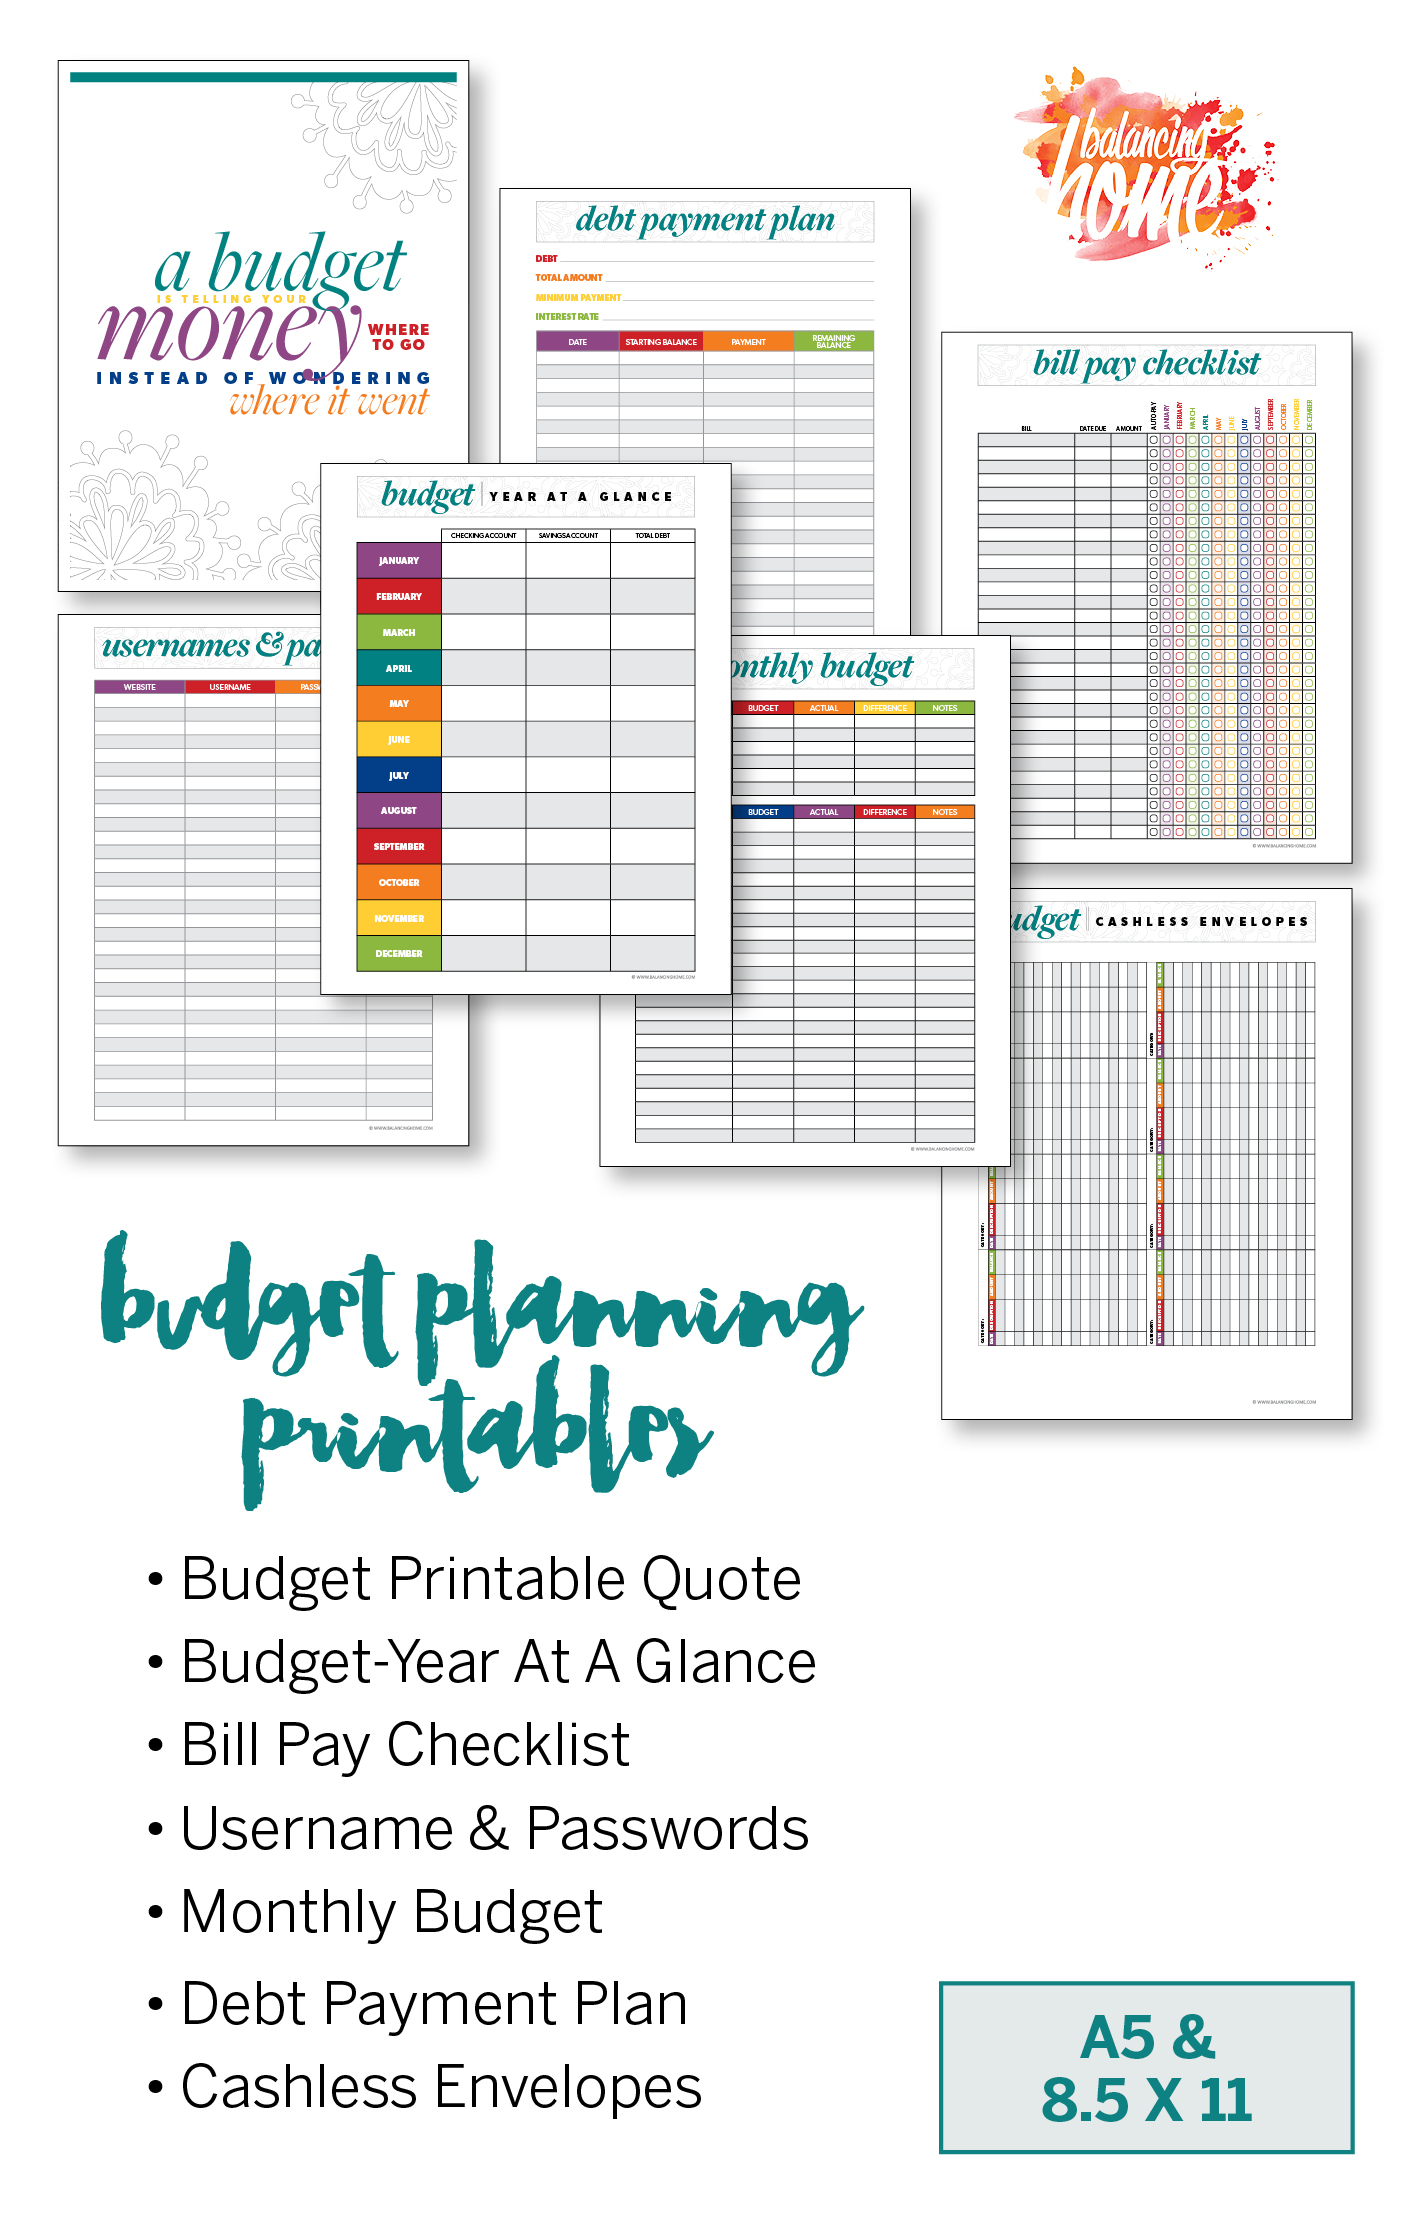 Budget-Graphics